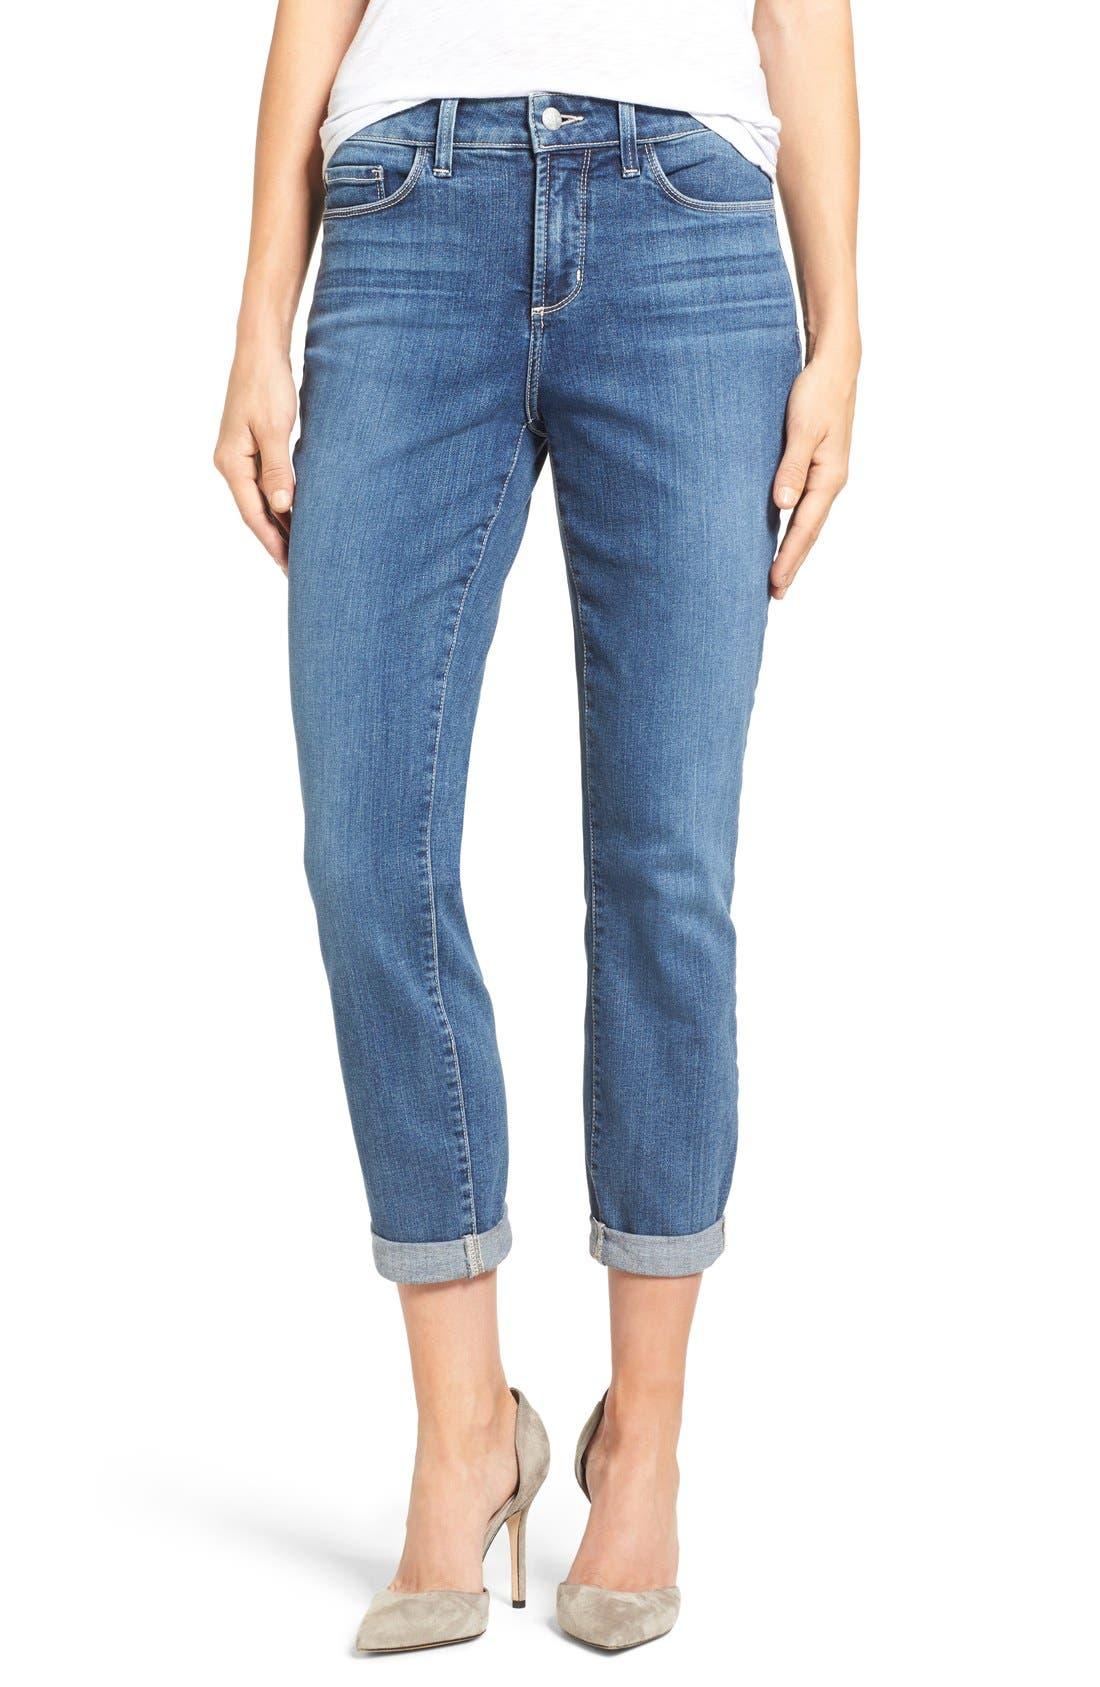 Main Image - NYDJ Alina Stretch Ankle Jeans (Heyburn) (Regular & Petite)